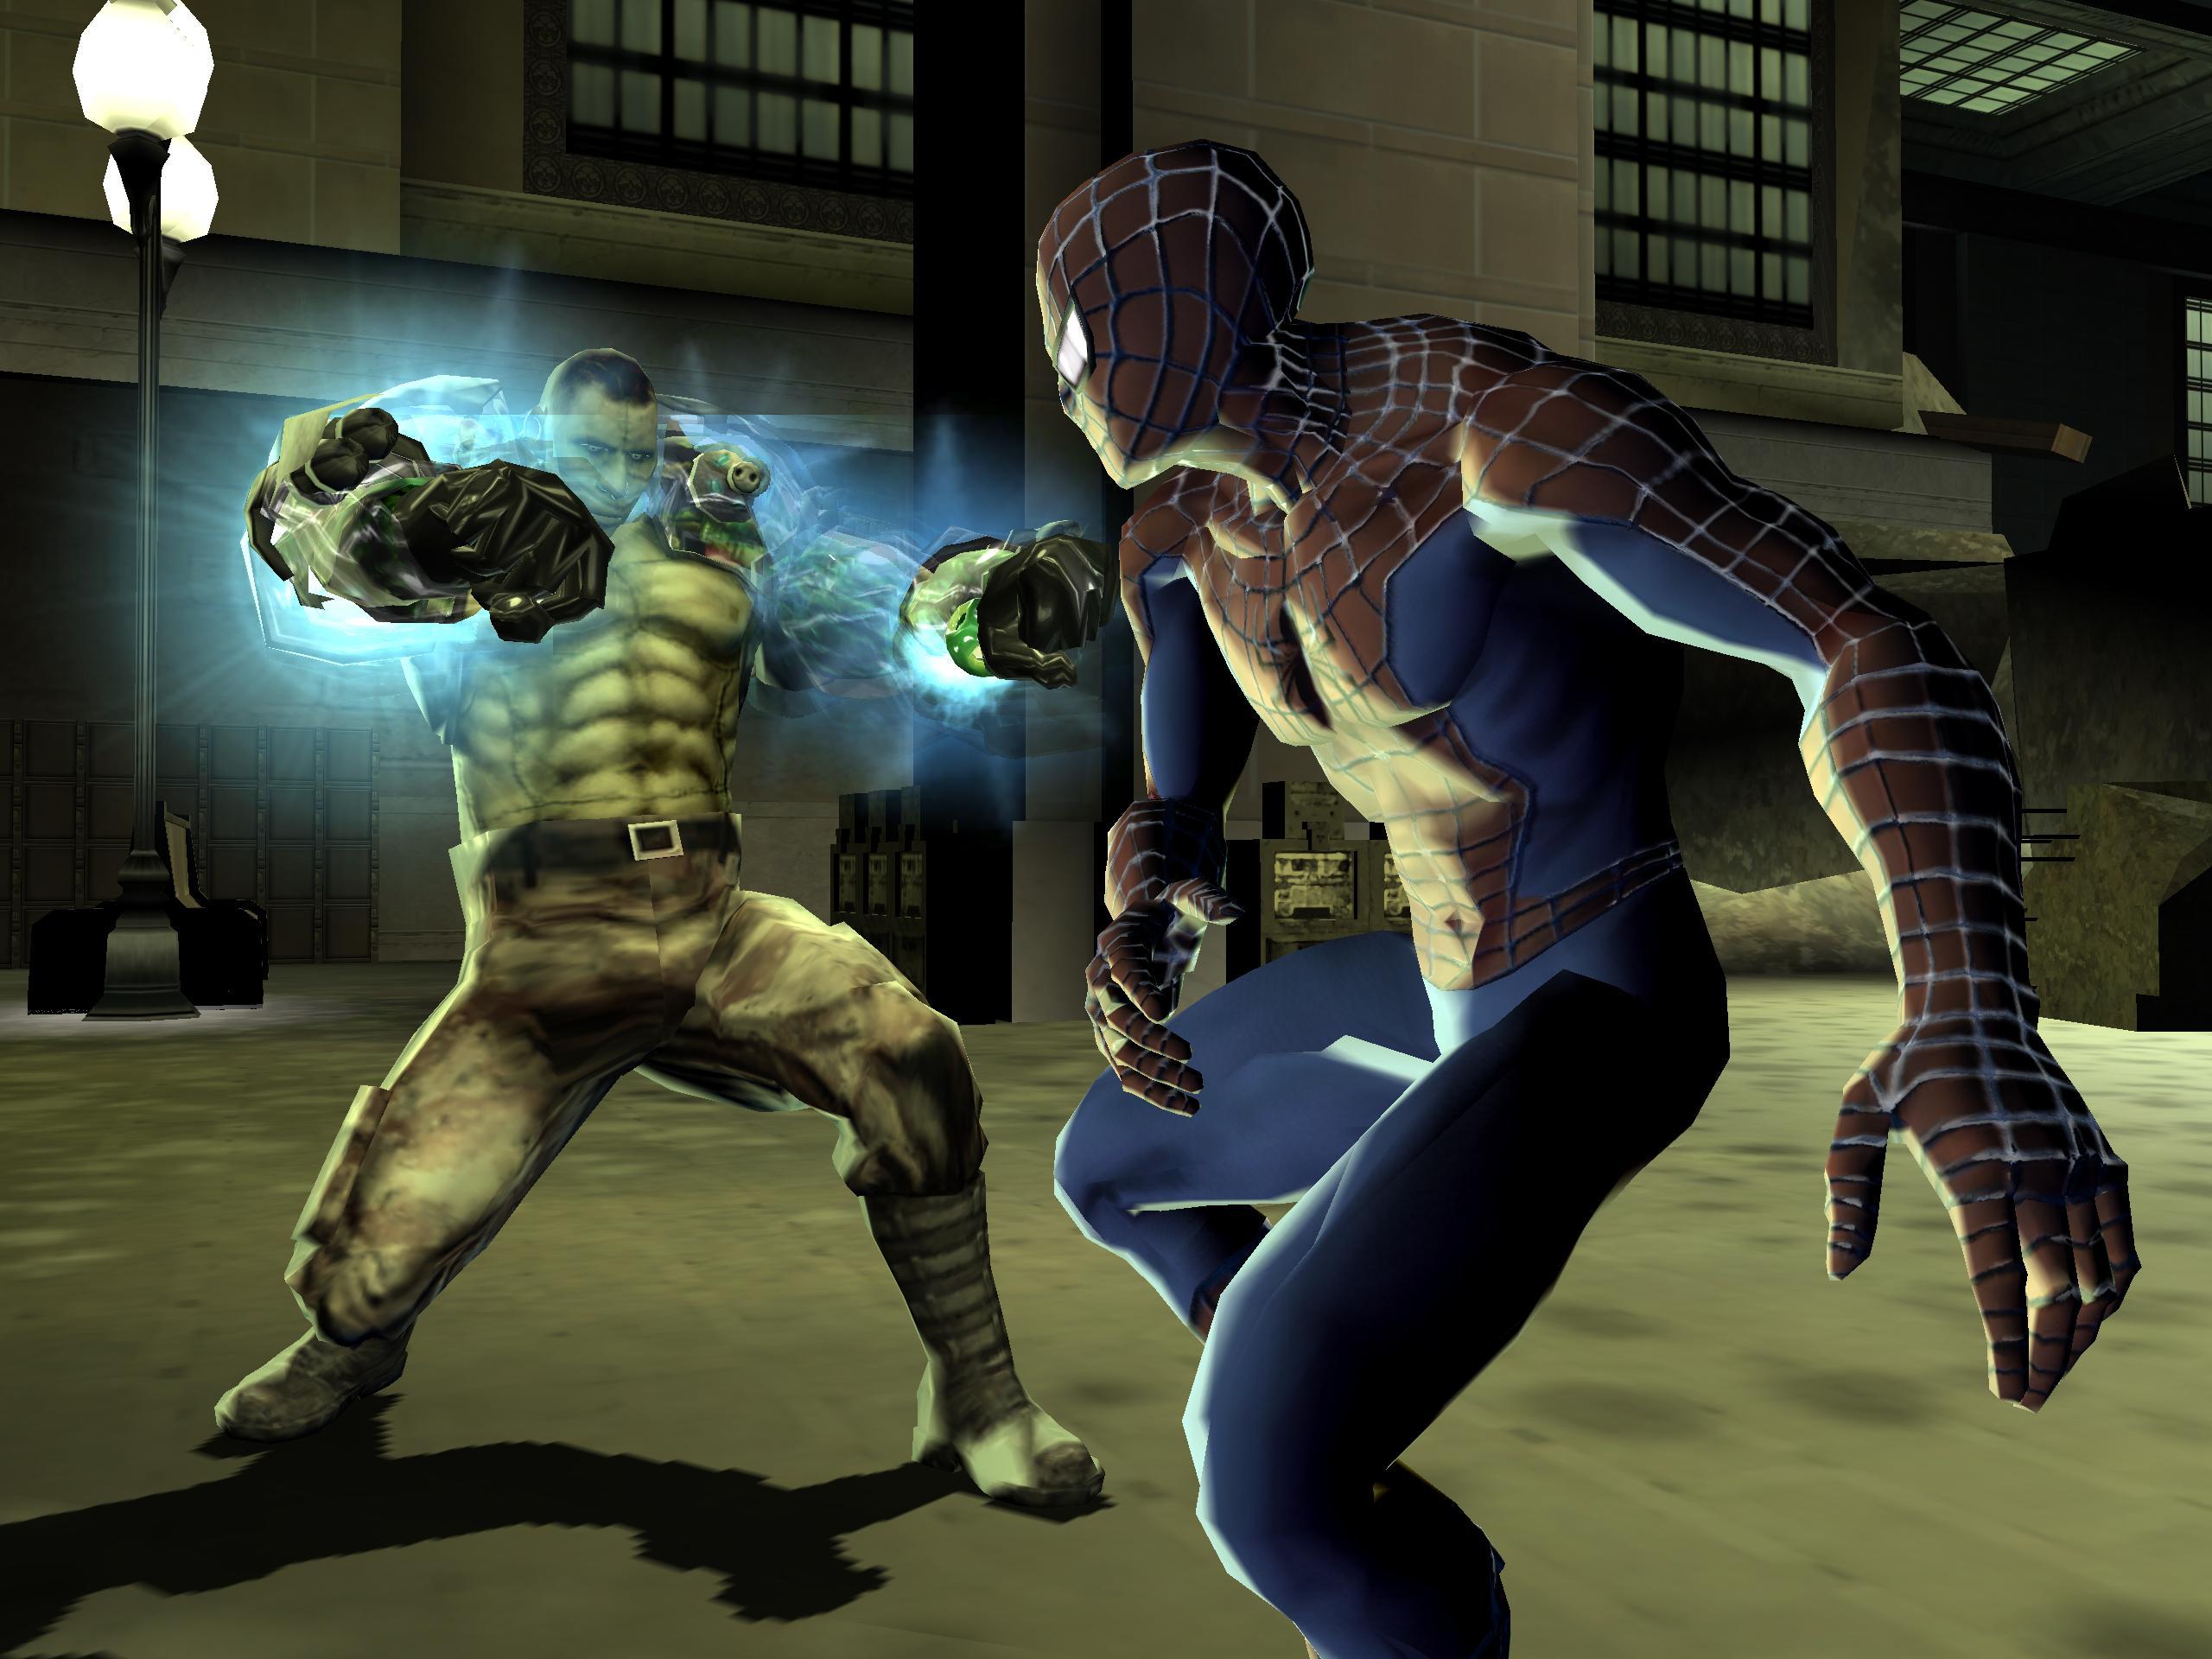 Marvel nemesis characters